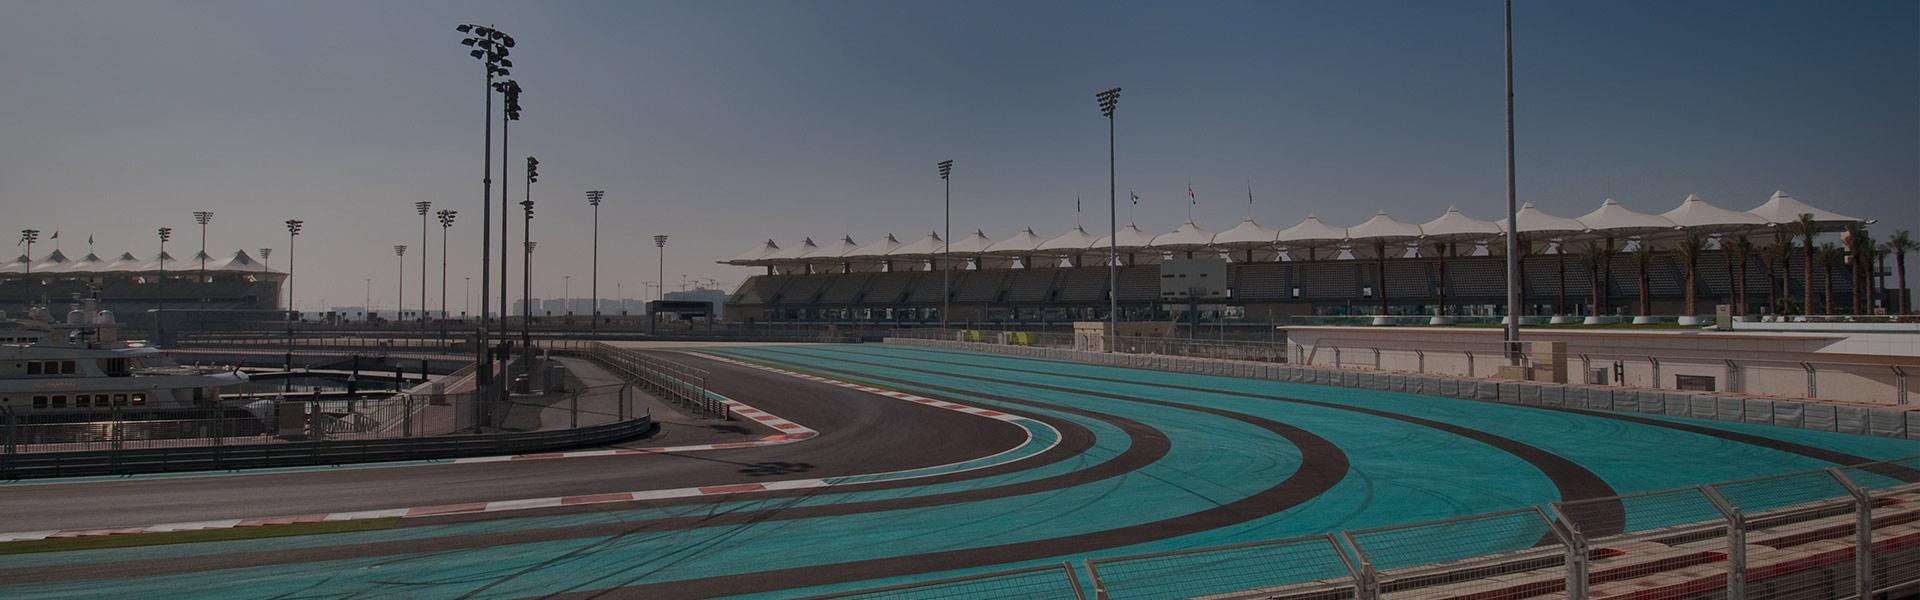 F1 racing track at Yas Island Abu Dhabi